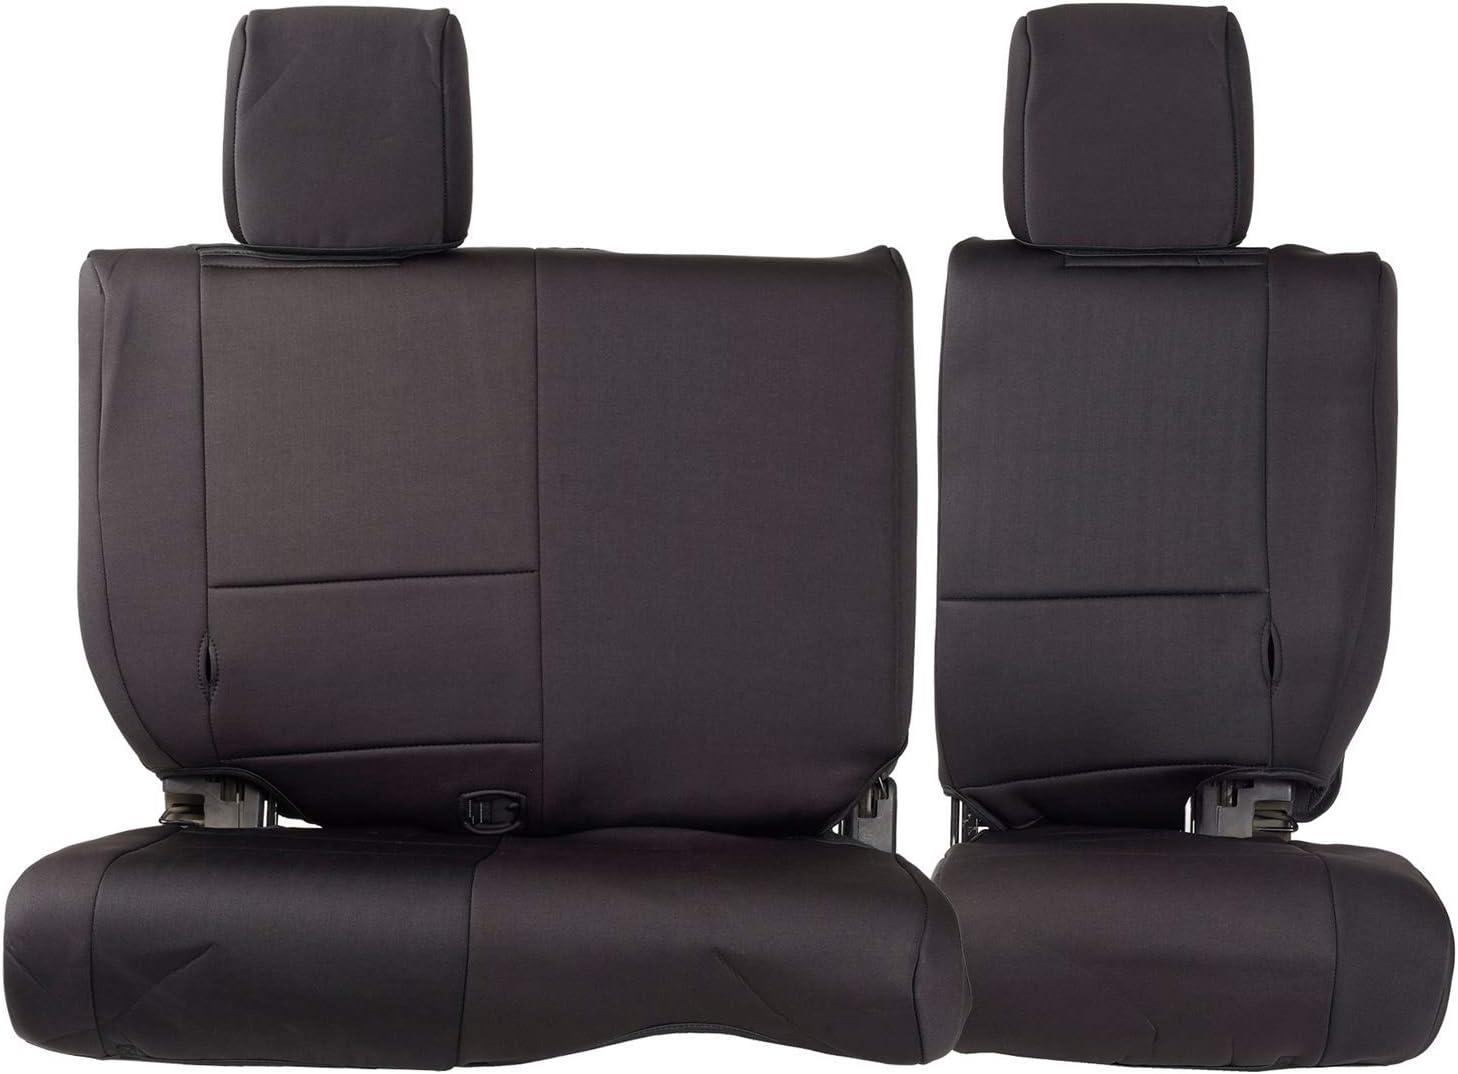 Smittybilt 471601 Neoprene New popularity Bombing free shipping Seat Set Cover